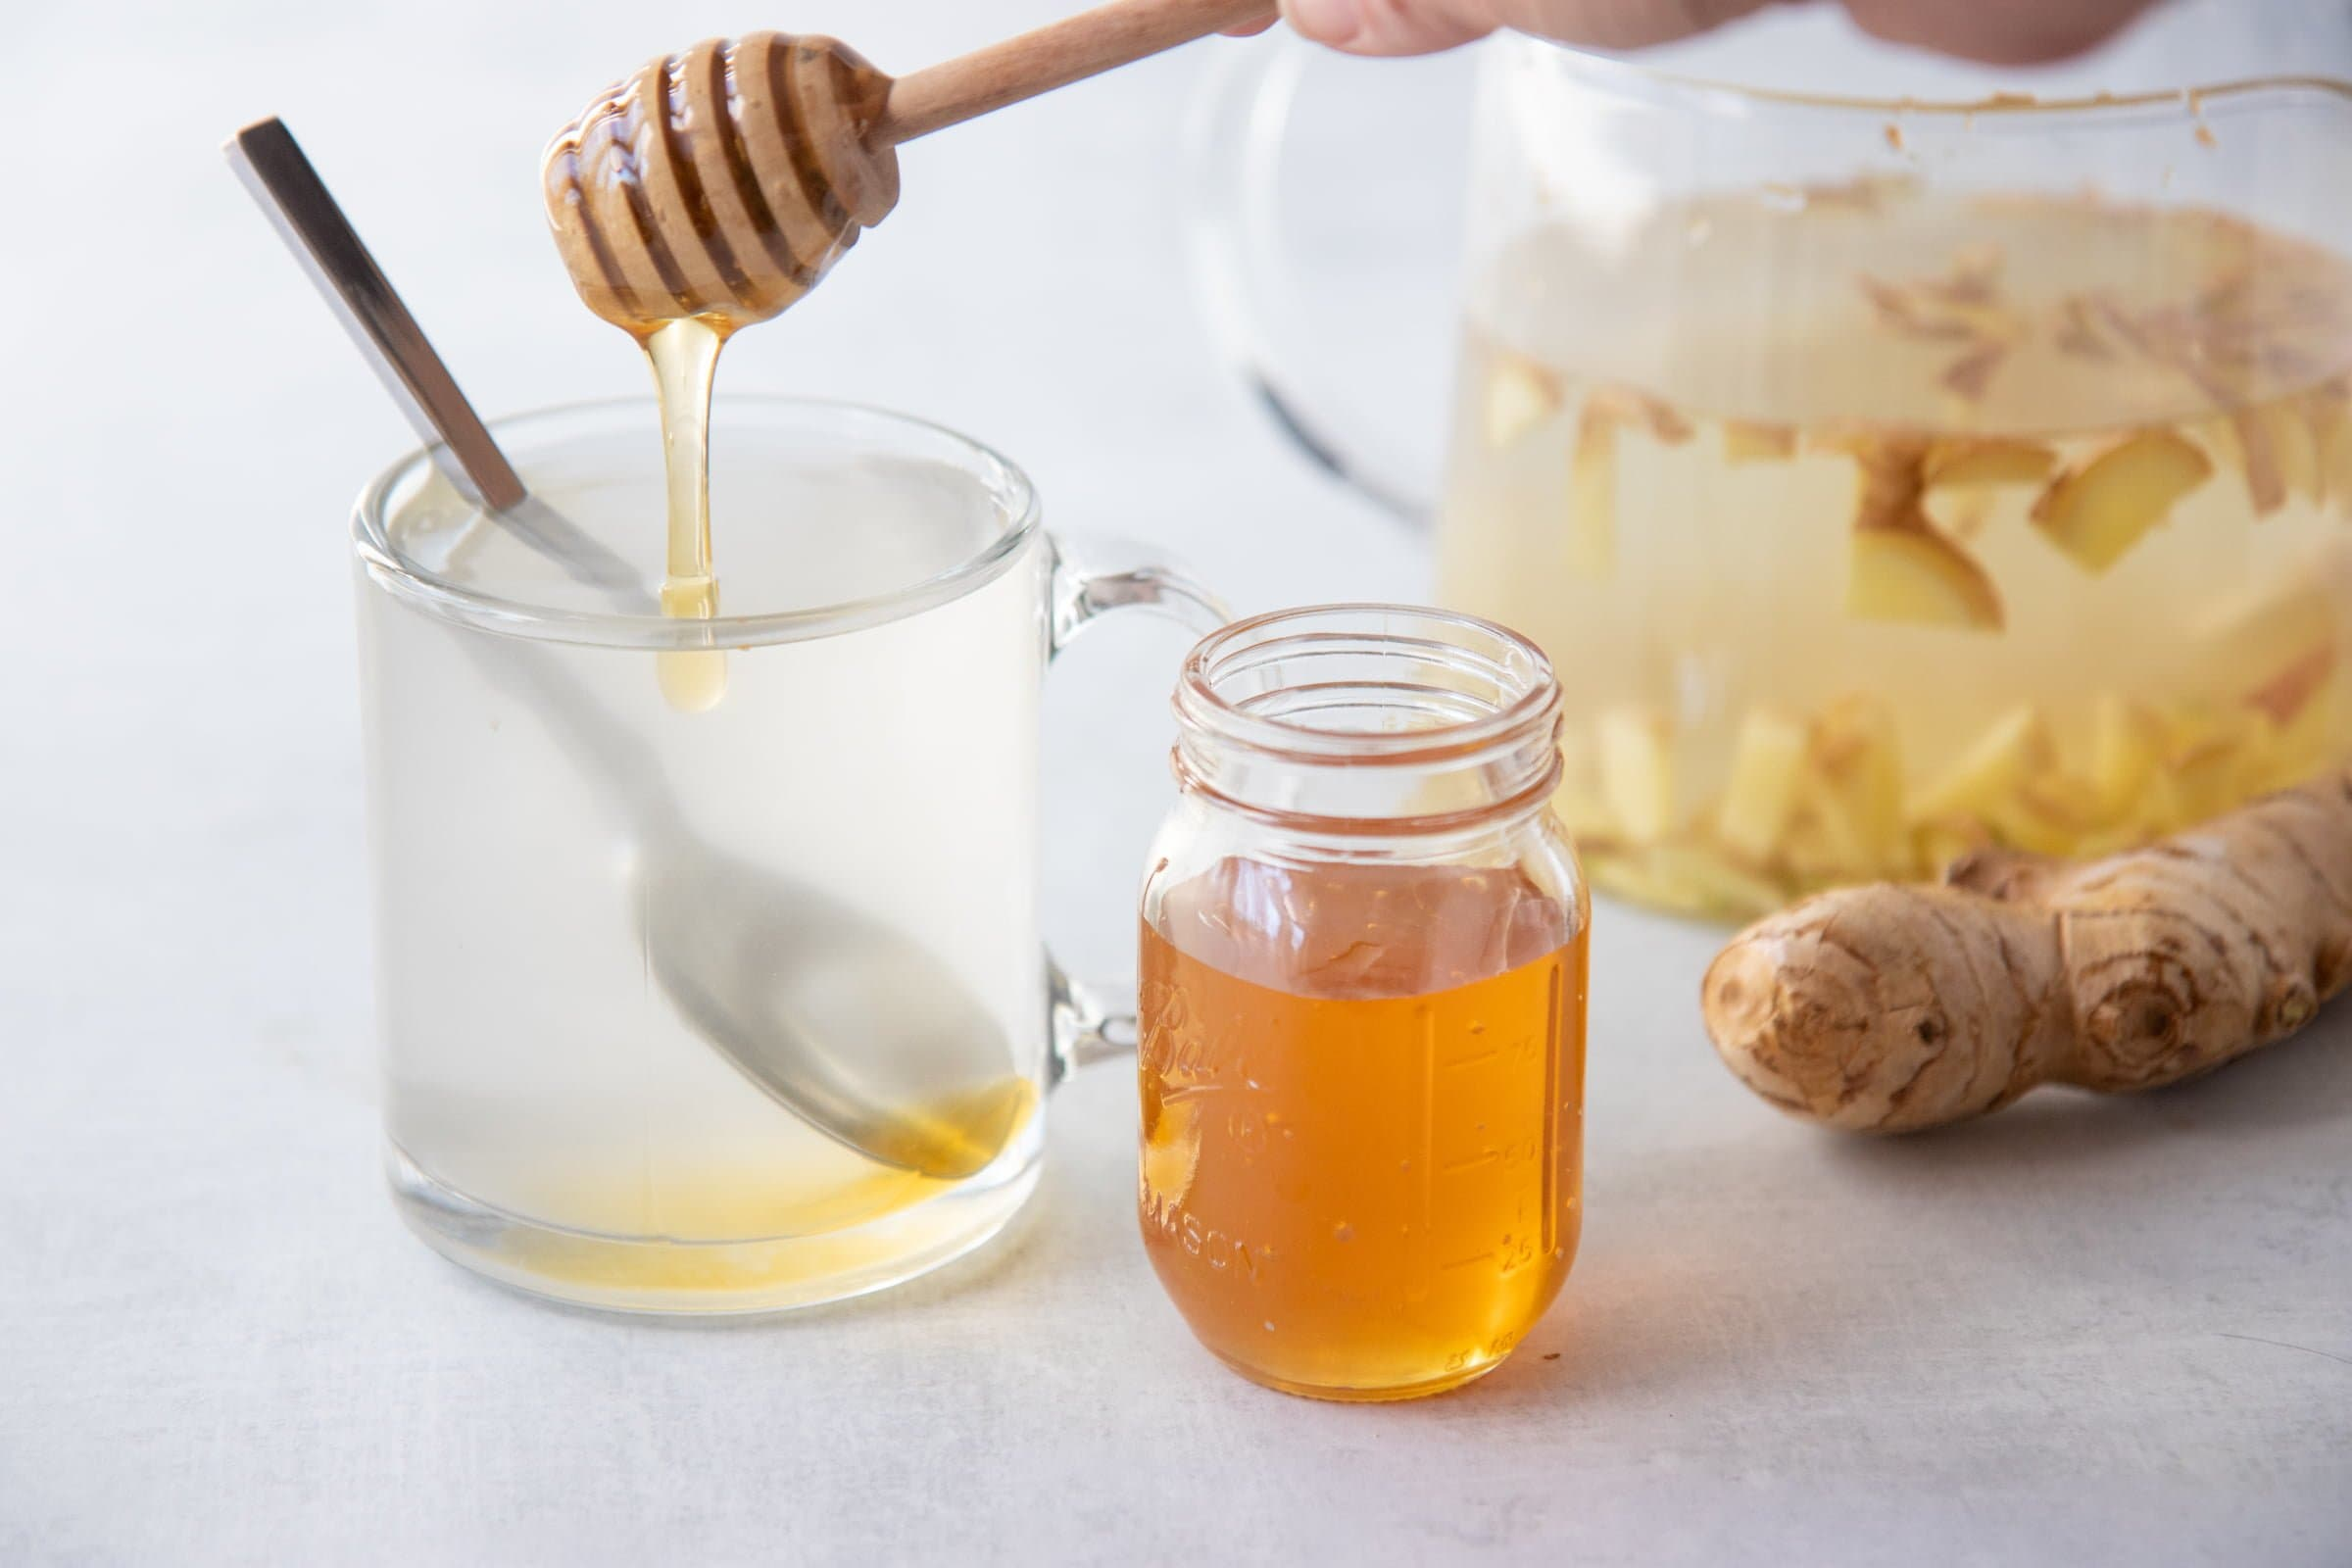 Honey stirrer drizzling honey into a clear mug of ginger tea